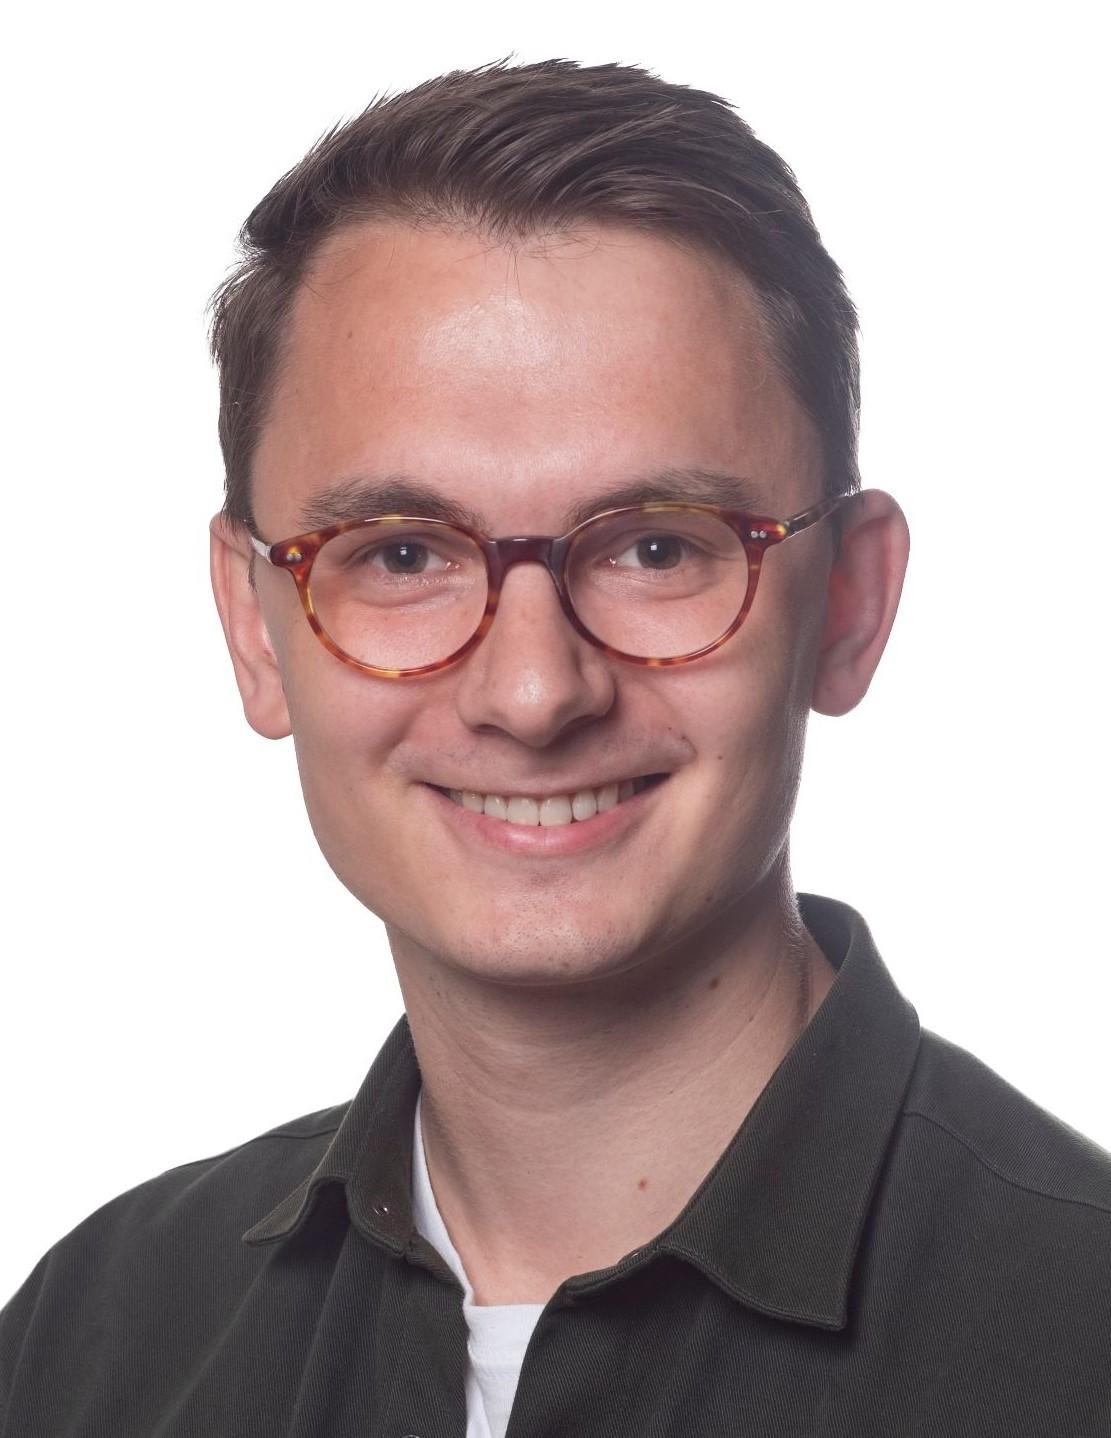 Mathias Busk Dahl